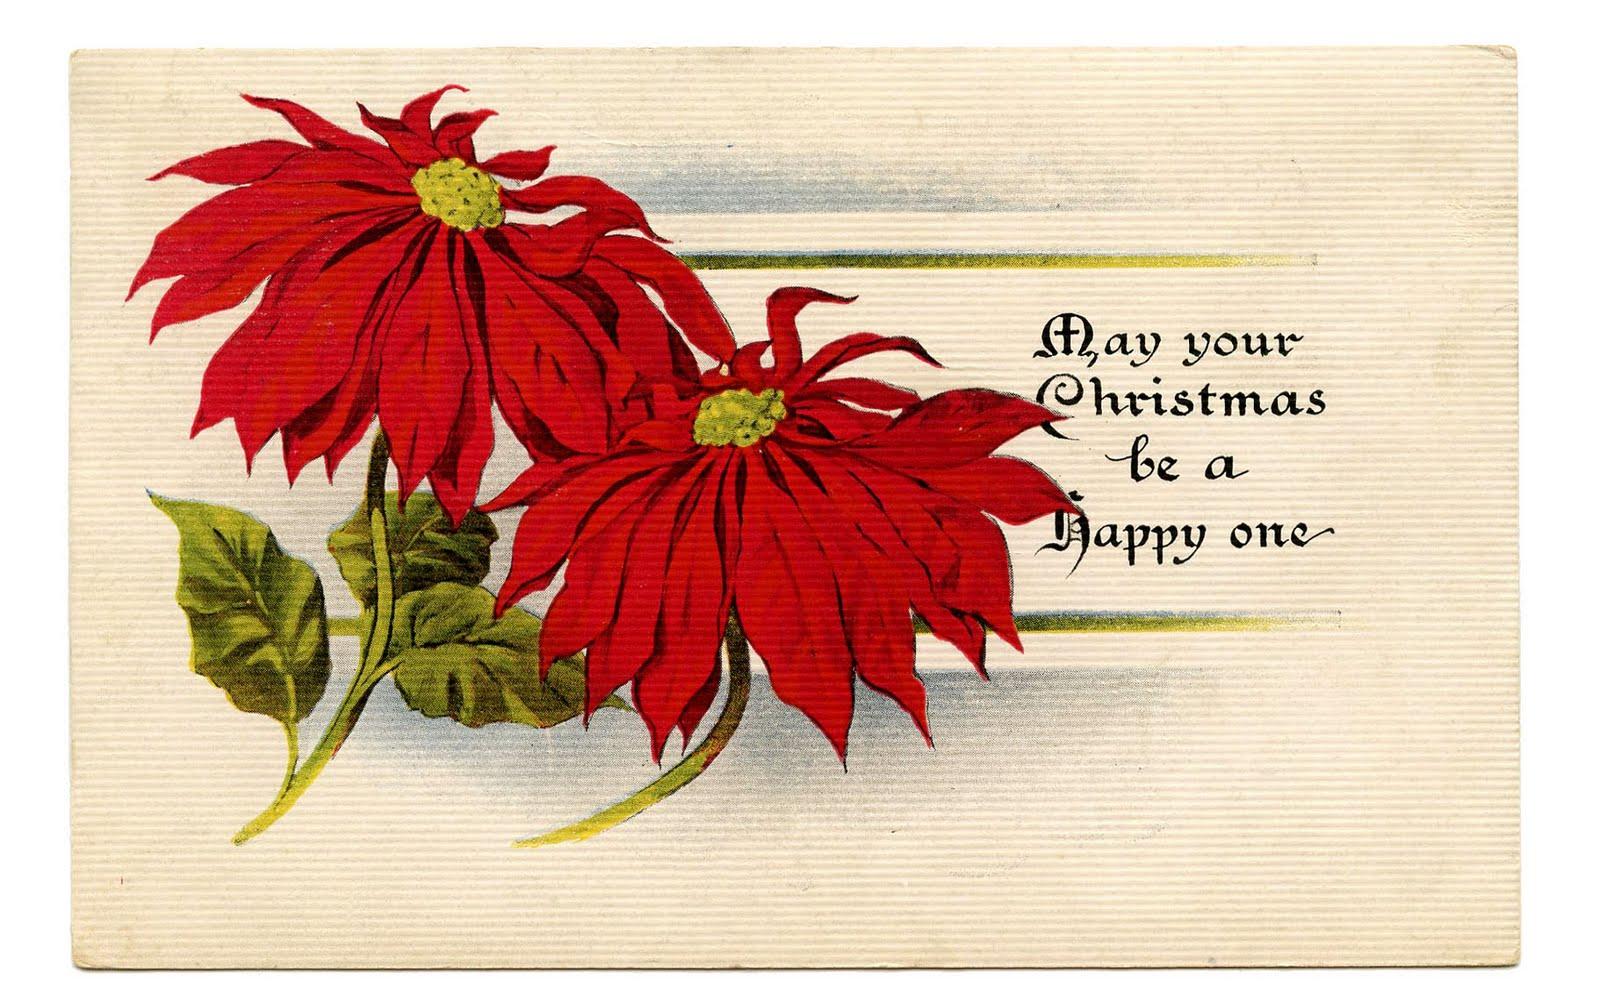 Vintage Christmas Clip Art Poinsettias The Graphics Fairy